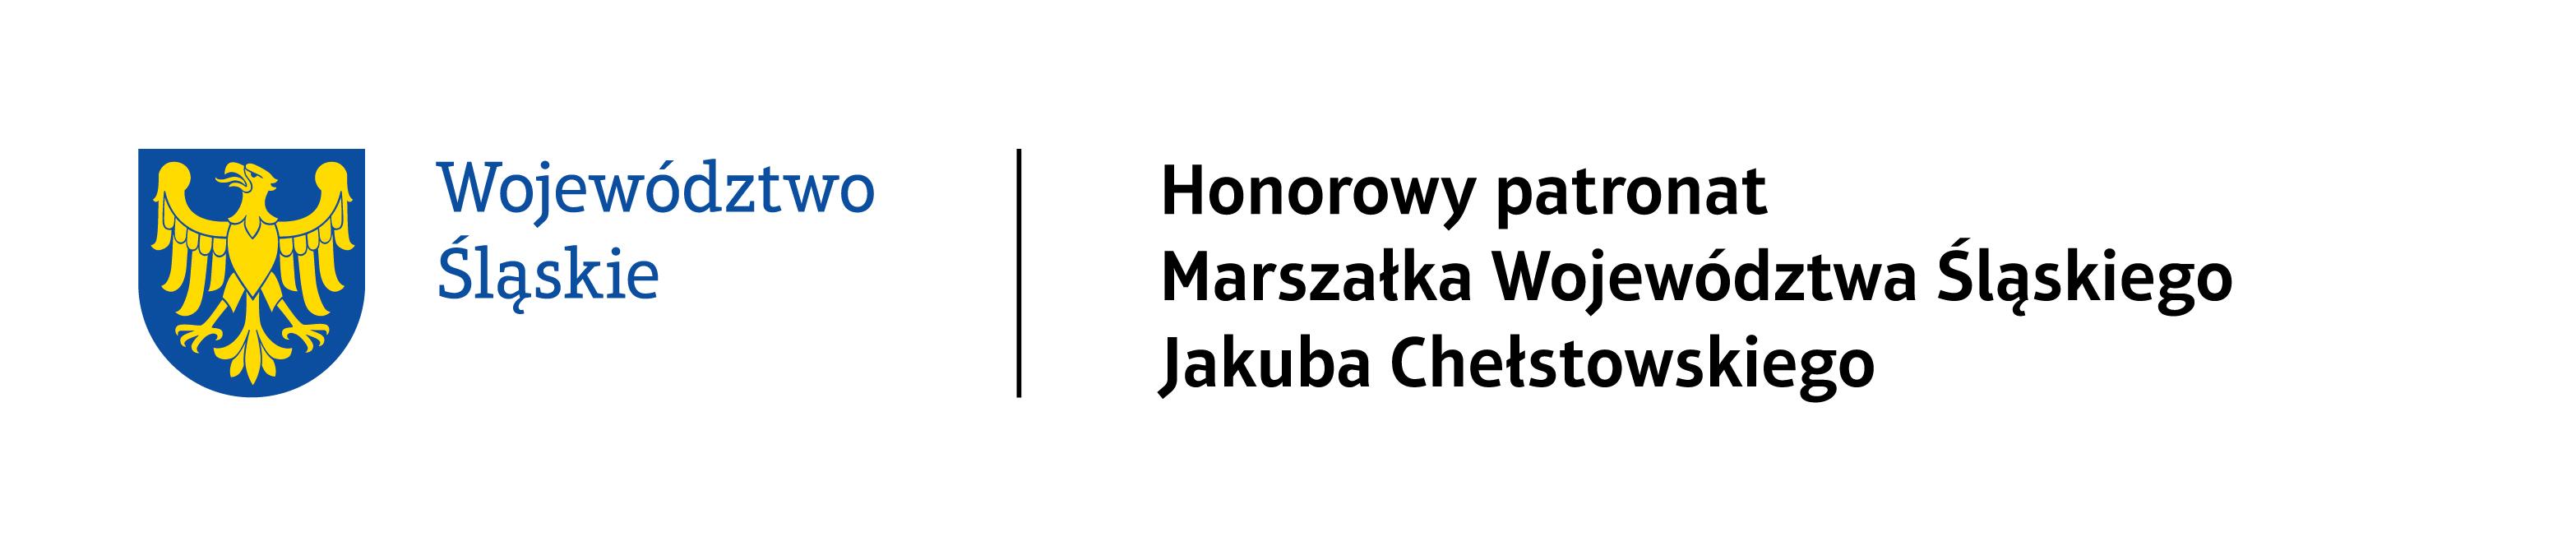 znak-PL_PATRONAT-Chelstowski-01